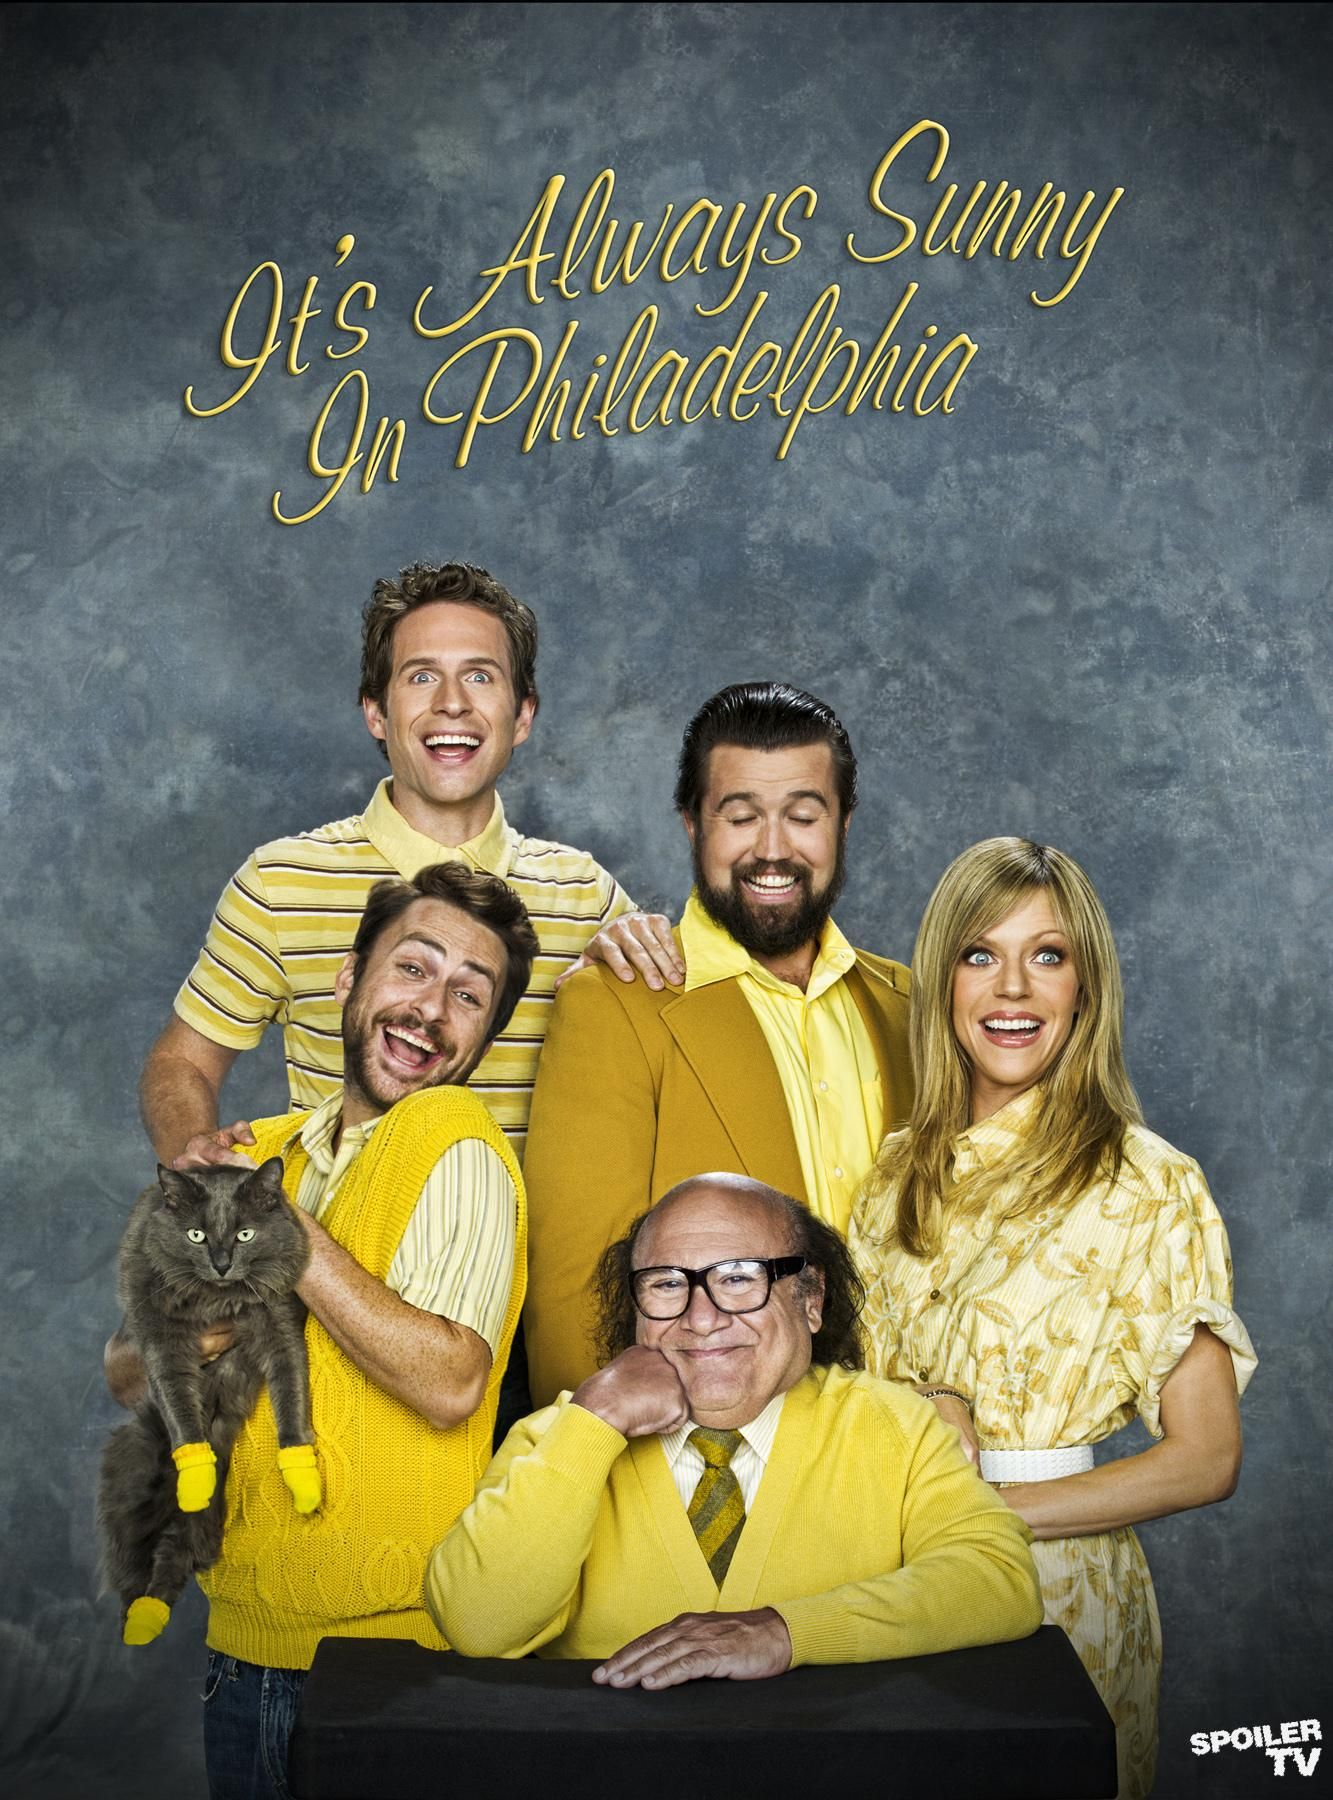 Pin By Saam Lemos On Kitten Mittens Awkward Family Photos Sunny In Philadelphia It S Always Sunny